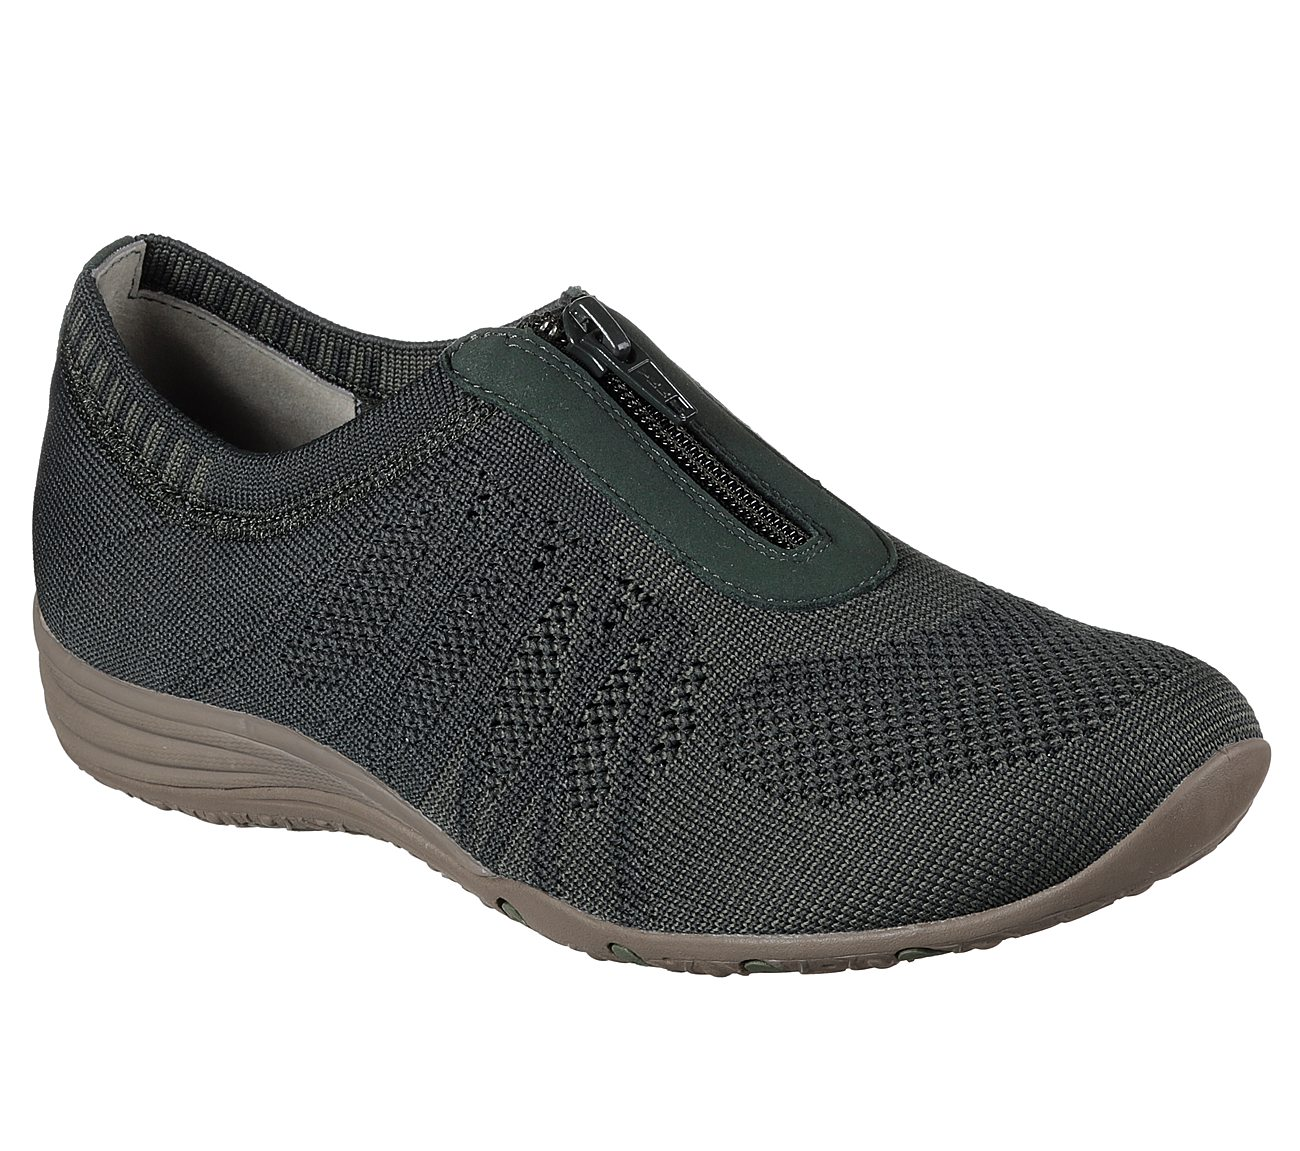 Buy SKECHERS Unity - Transcend Active Shoes